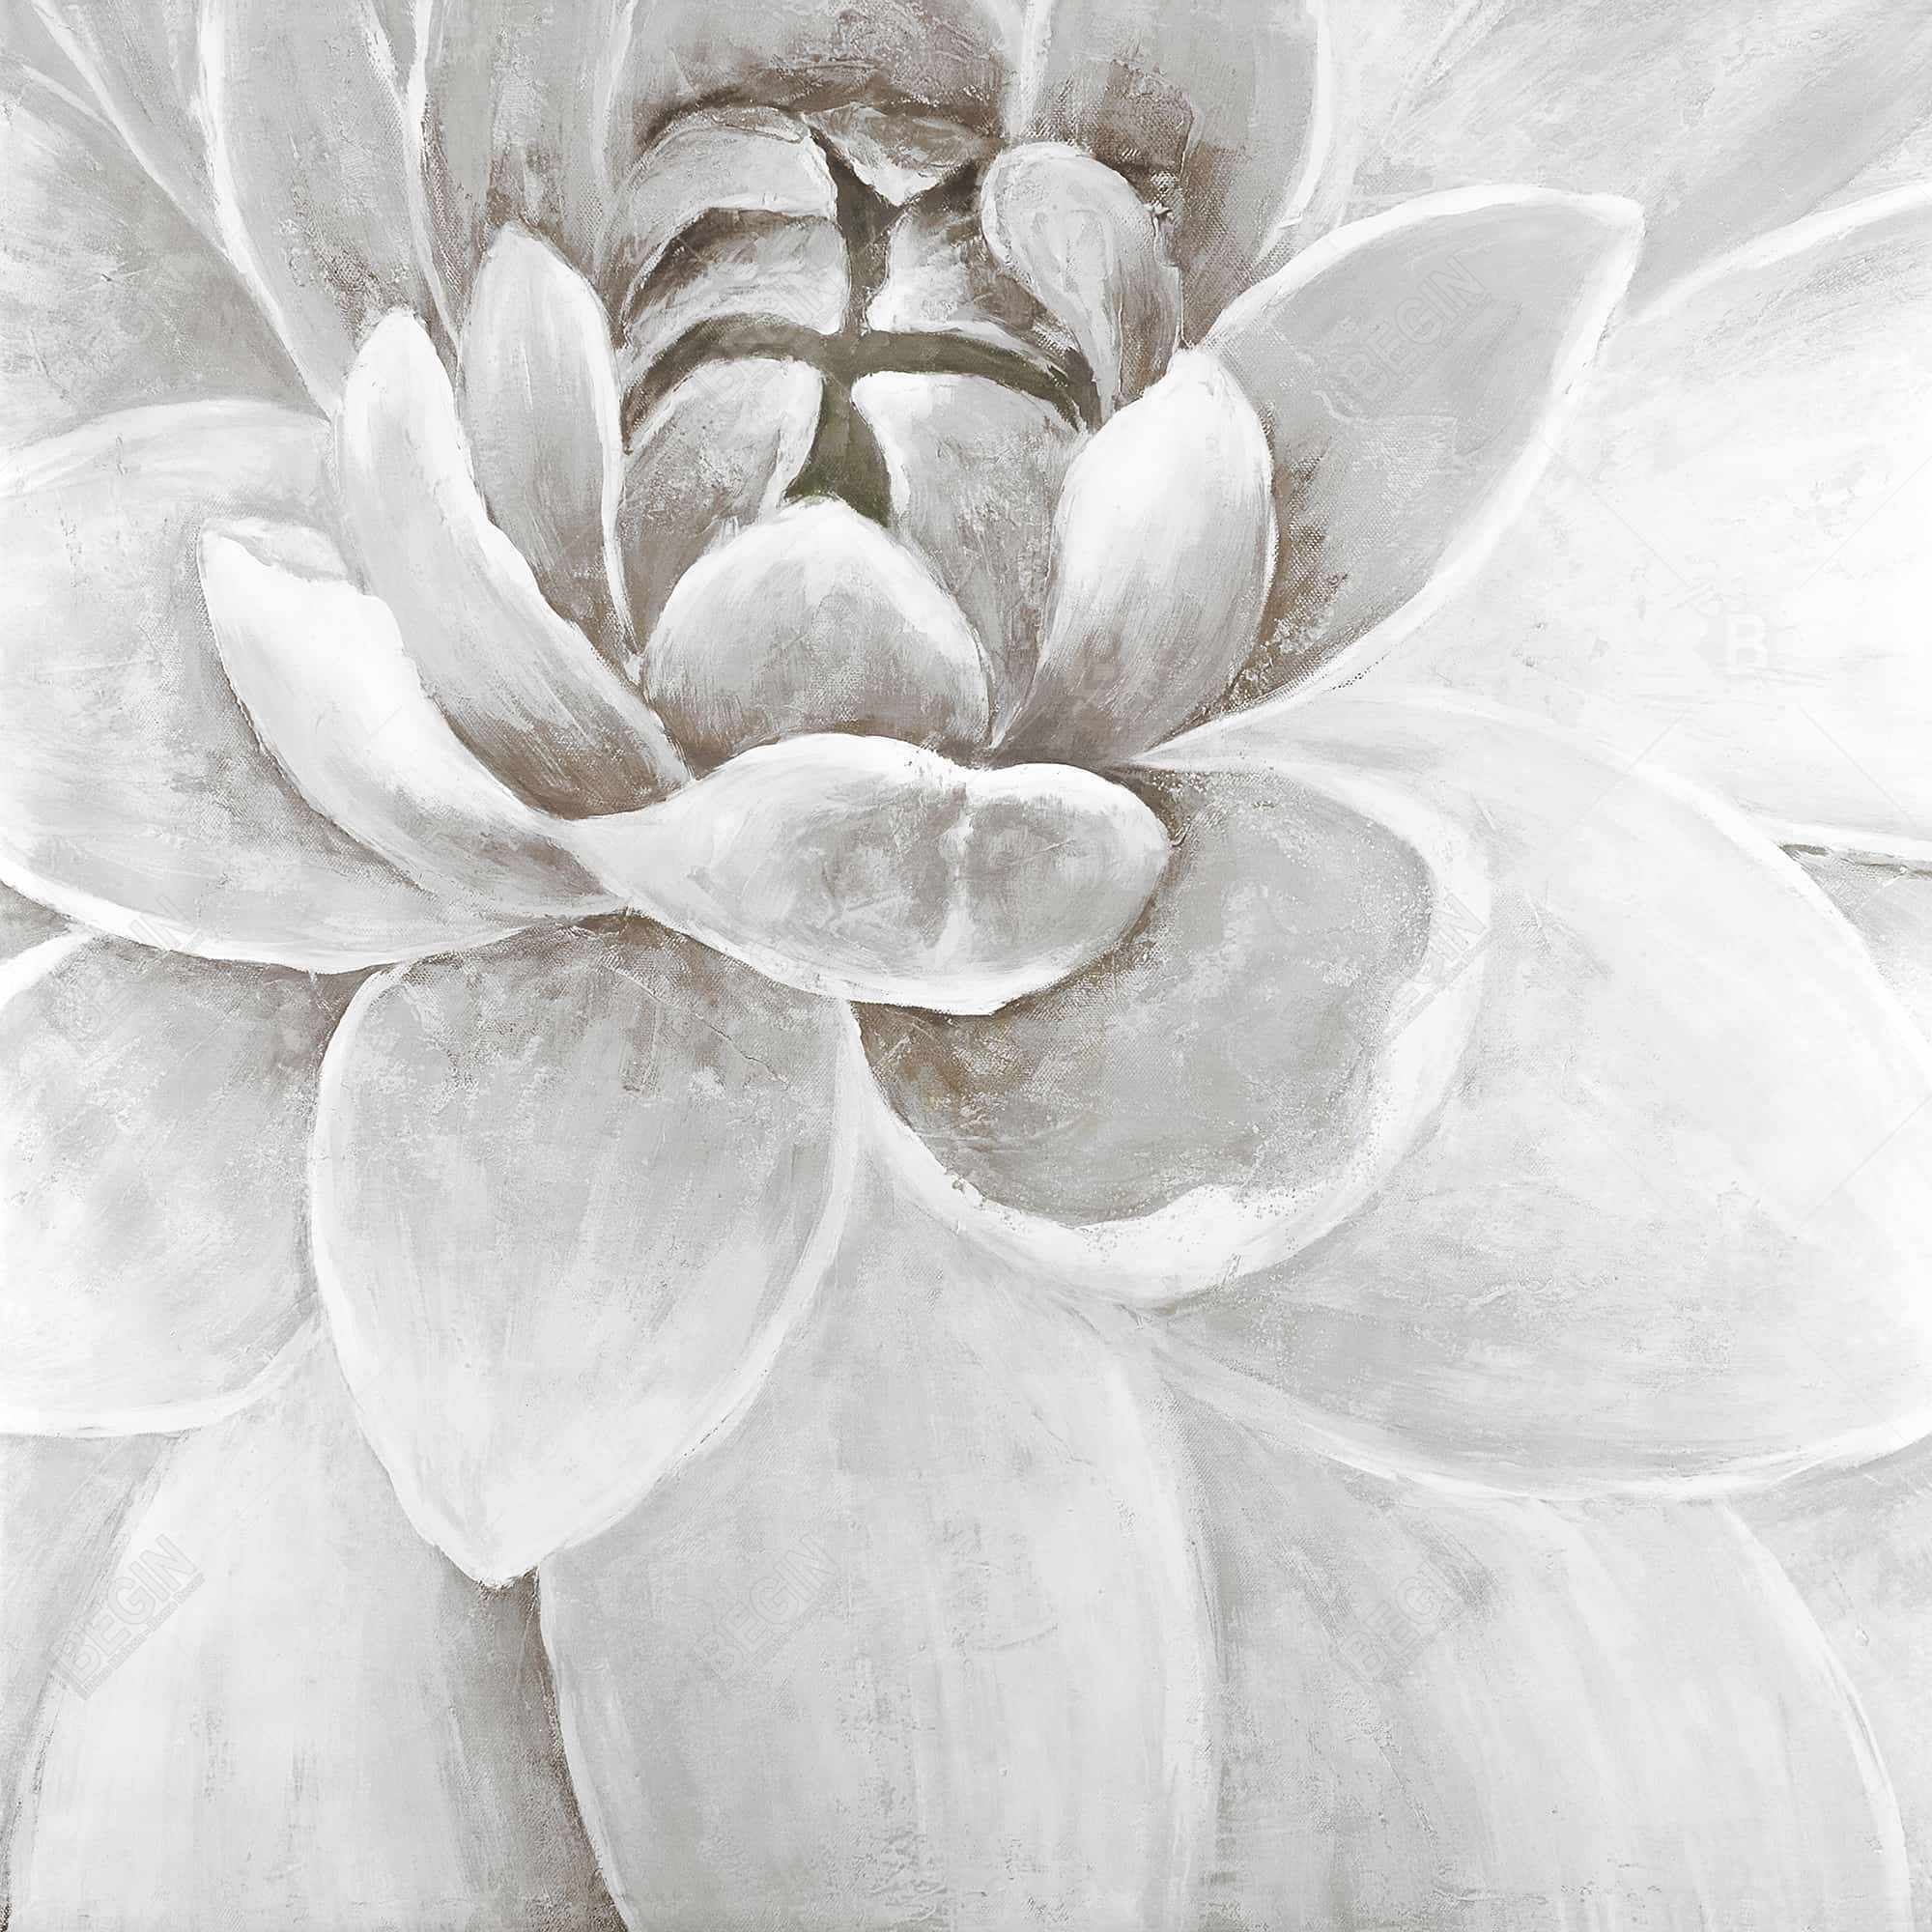 Delicate white chrysanthemum